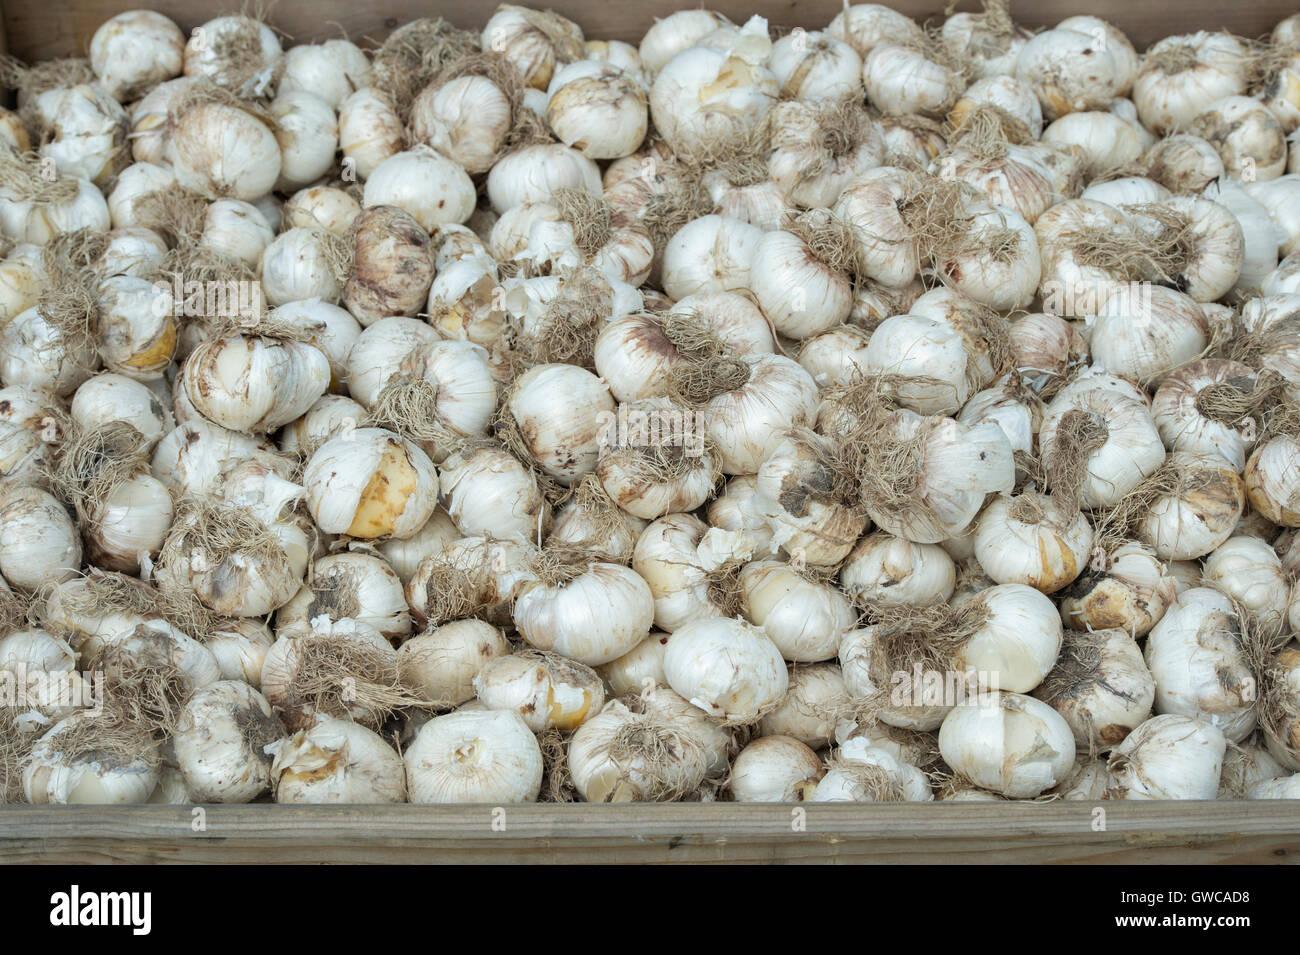 Allium hollandicum 'Purple Sensation'. Ornamental Onion flower bulbs in a wooden box Stock Photo